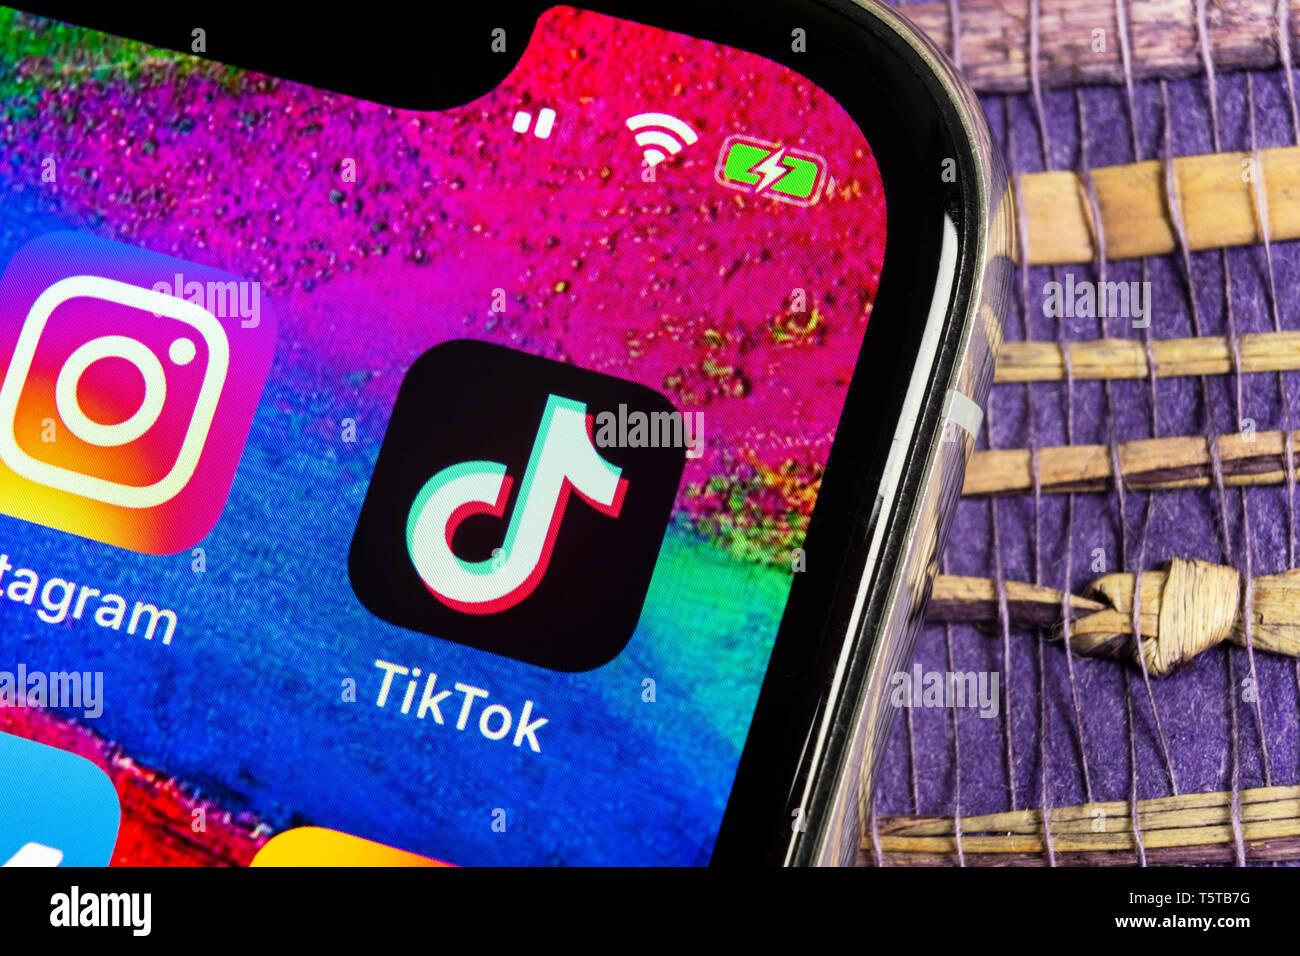 Helsinki Finland February 17 2019 Tik Tok Application Icon On Apple Iphone X Screen Close Up Tik Tok Icon Tik Tok Application Tiktok Social Me Stock Photo Alamy